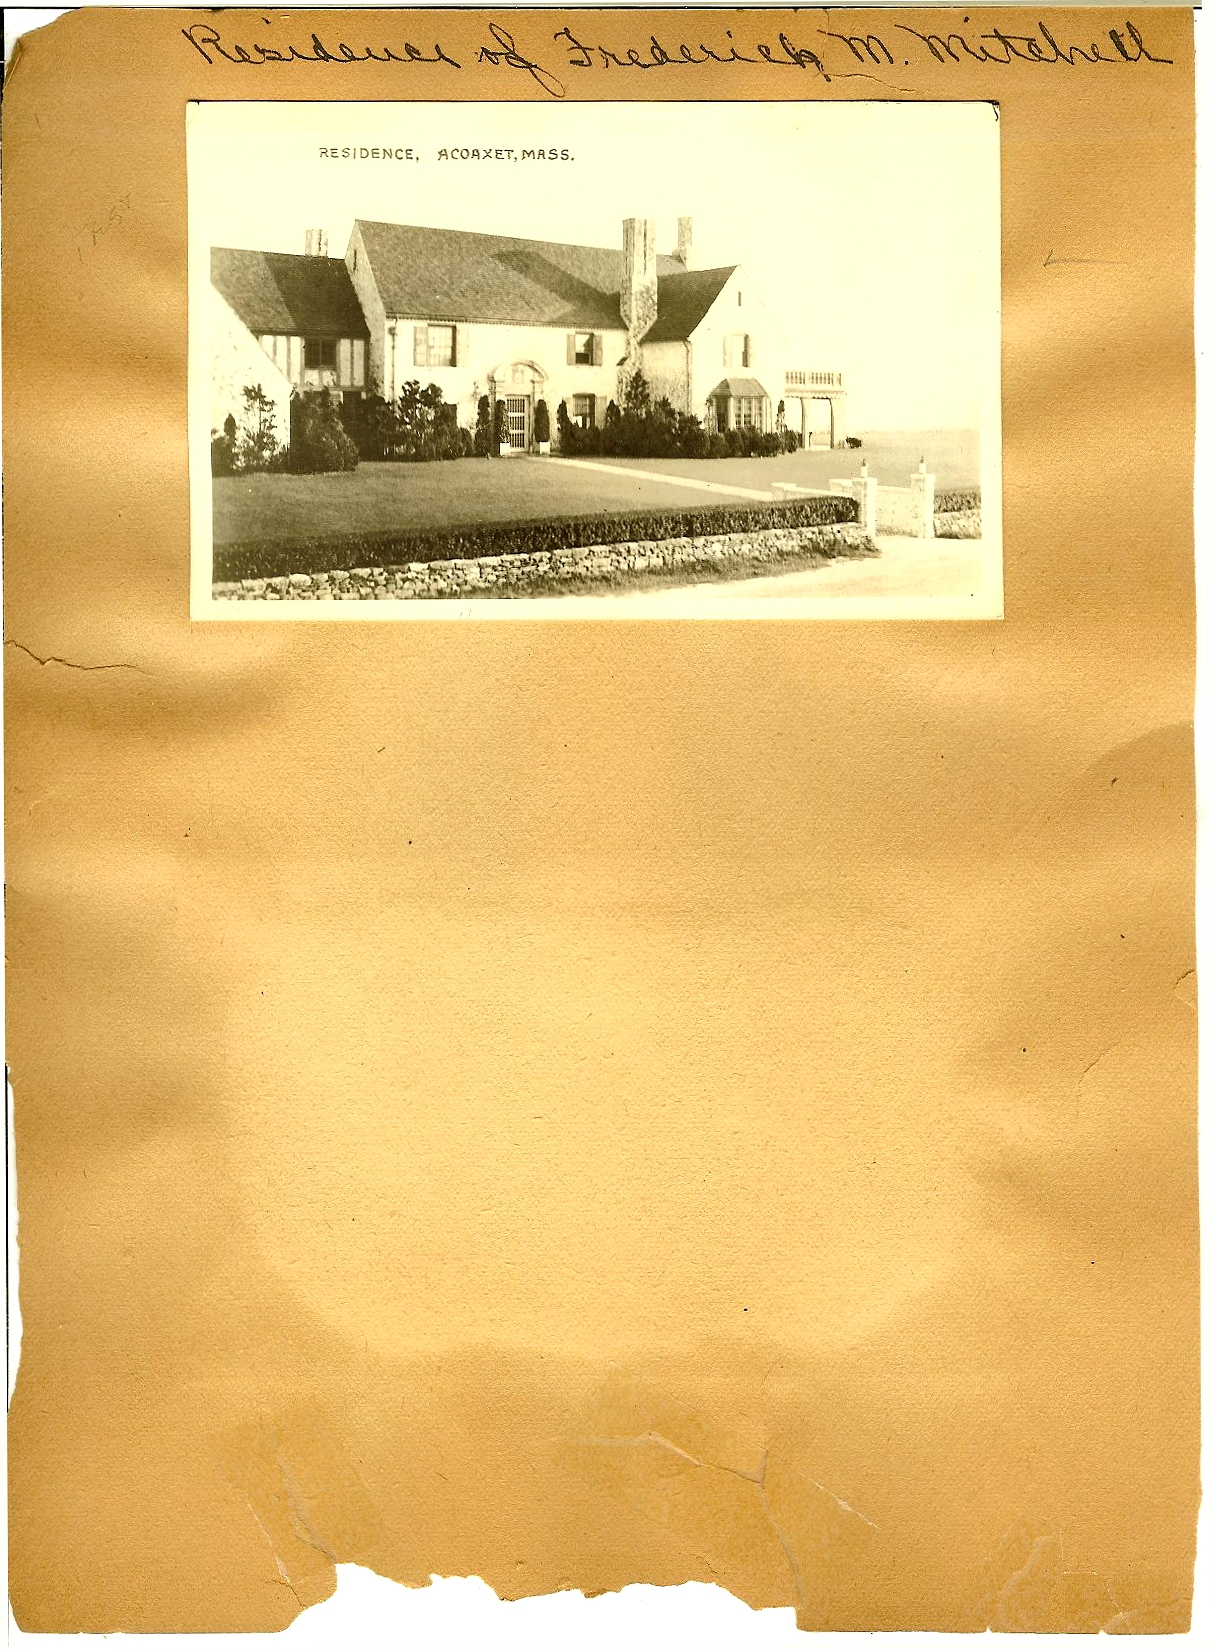 The 1938 Hurricane photos p22